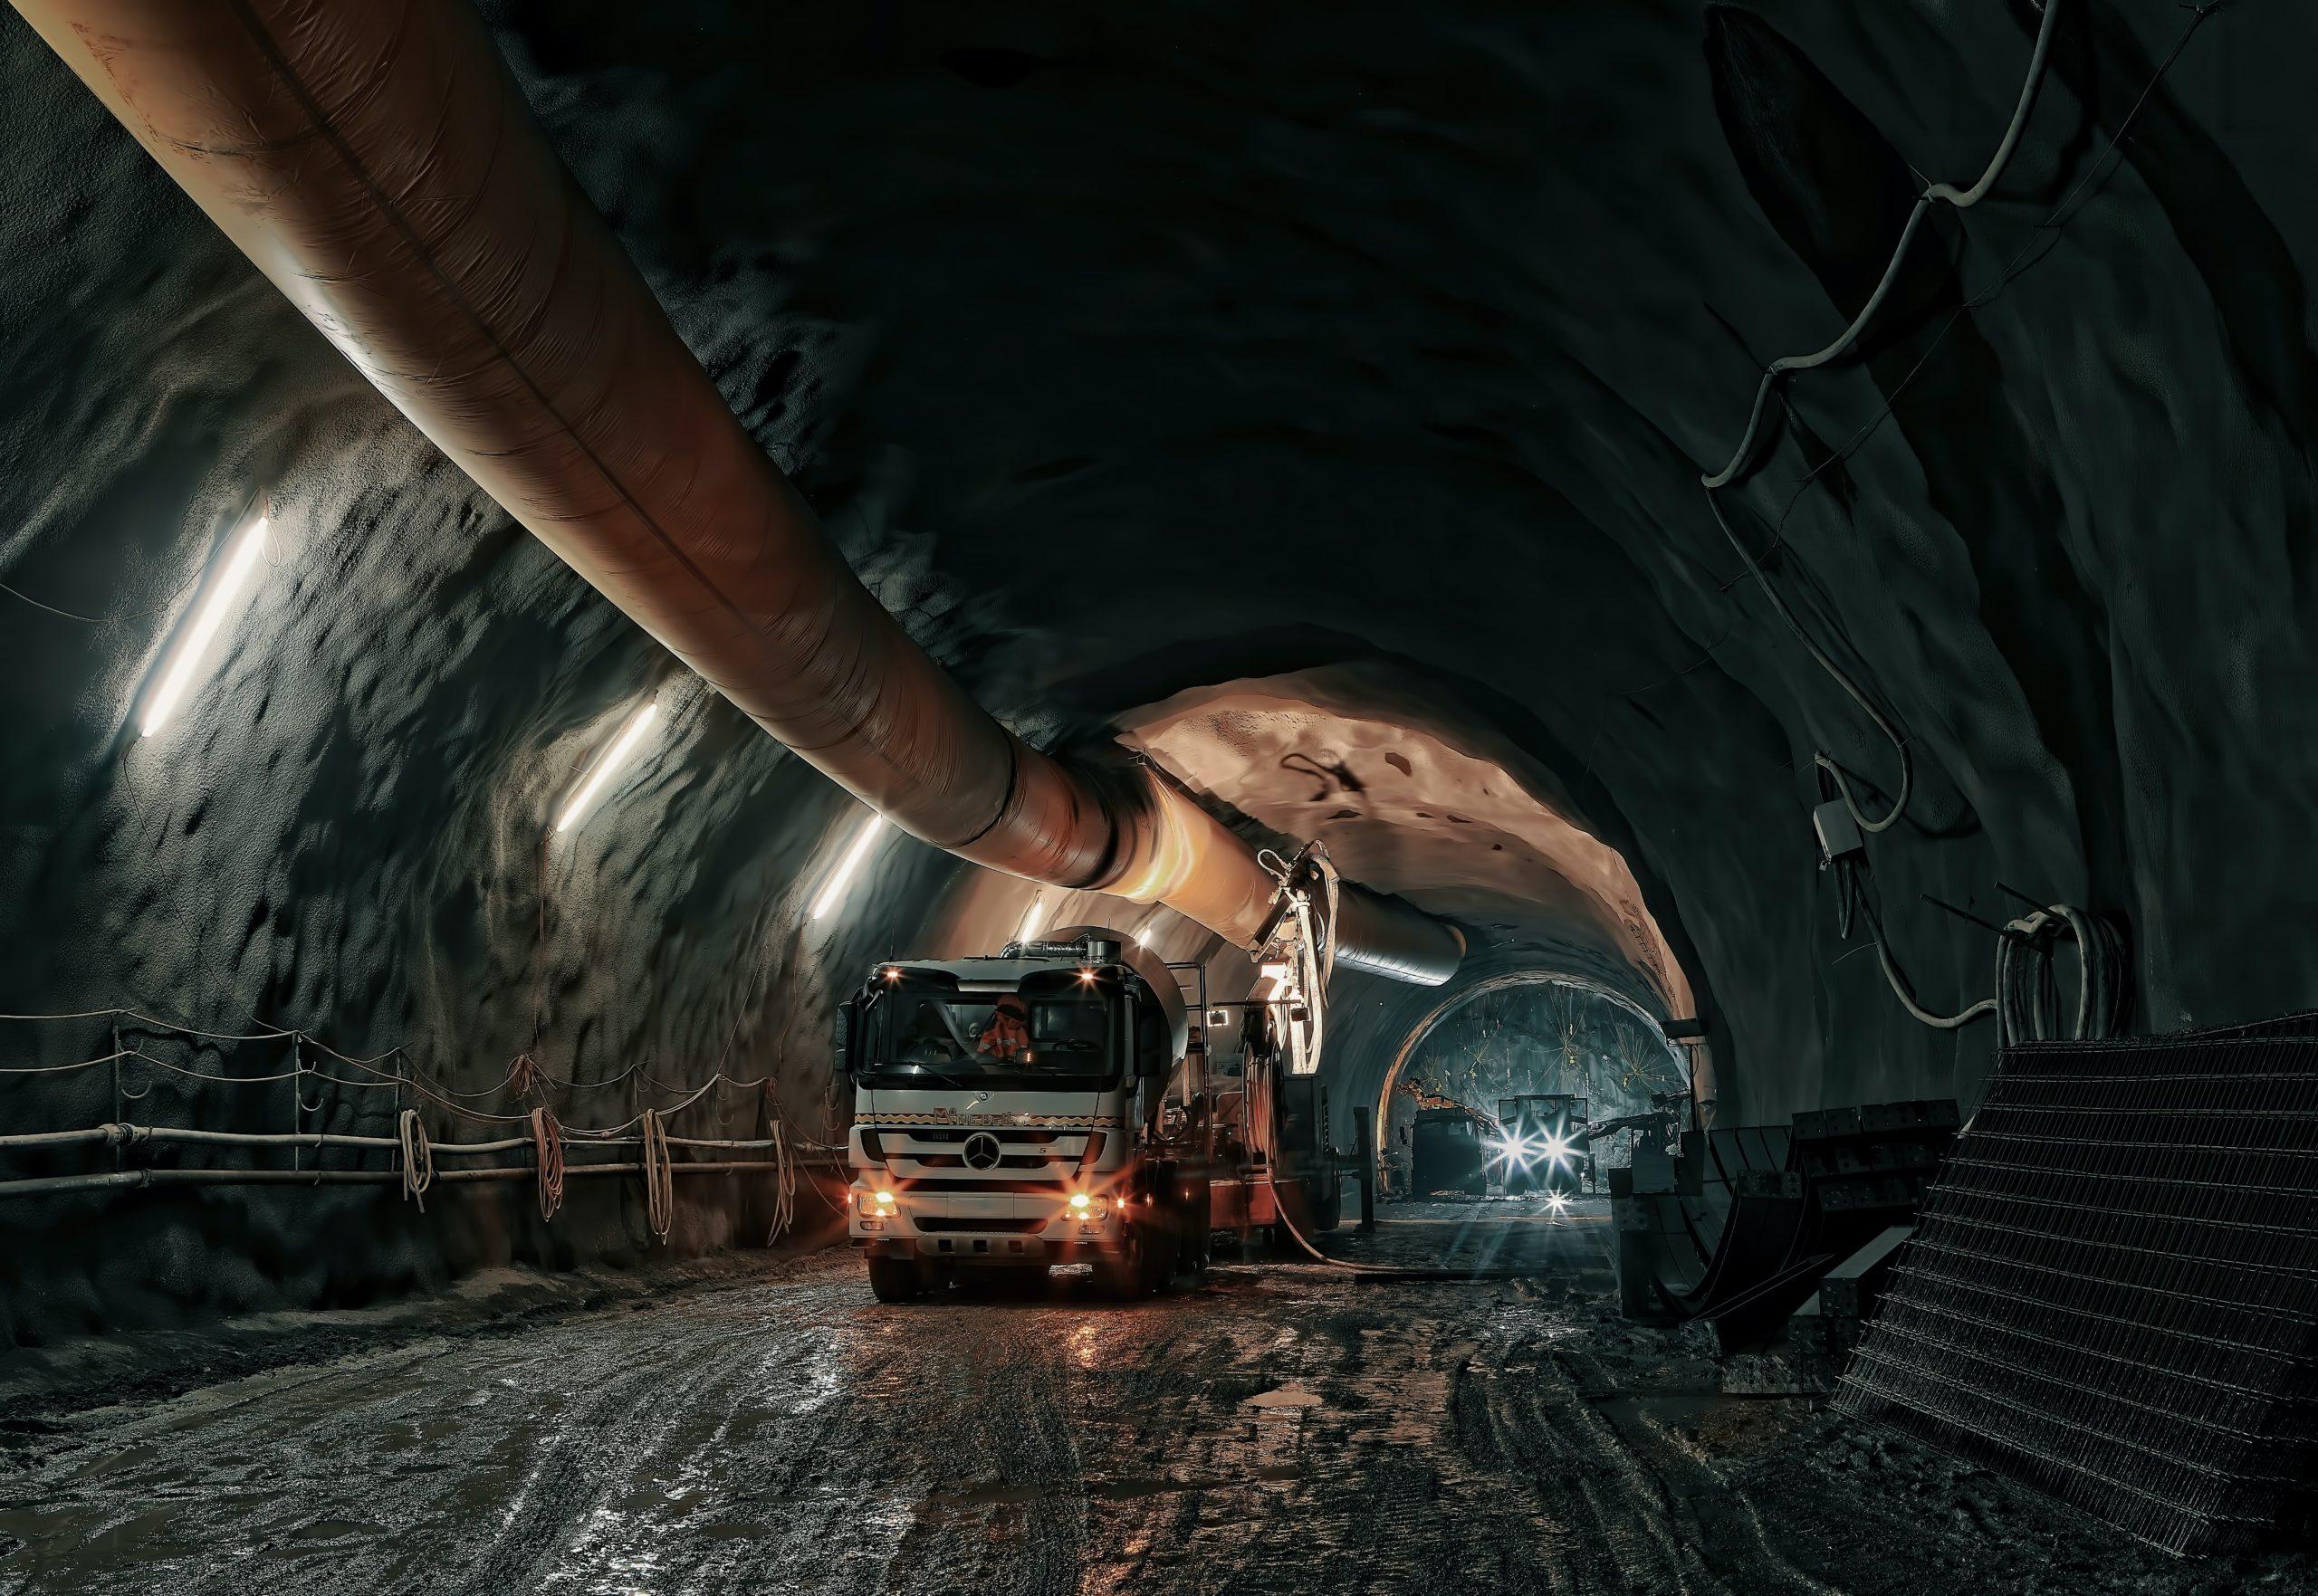 sensors in underground mining environments